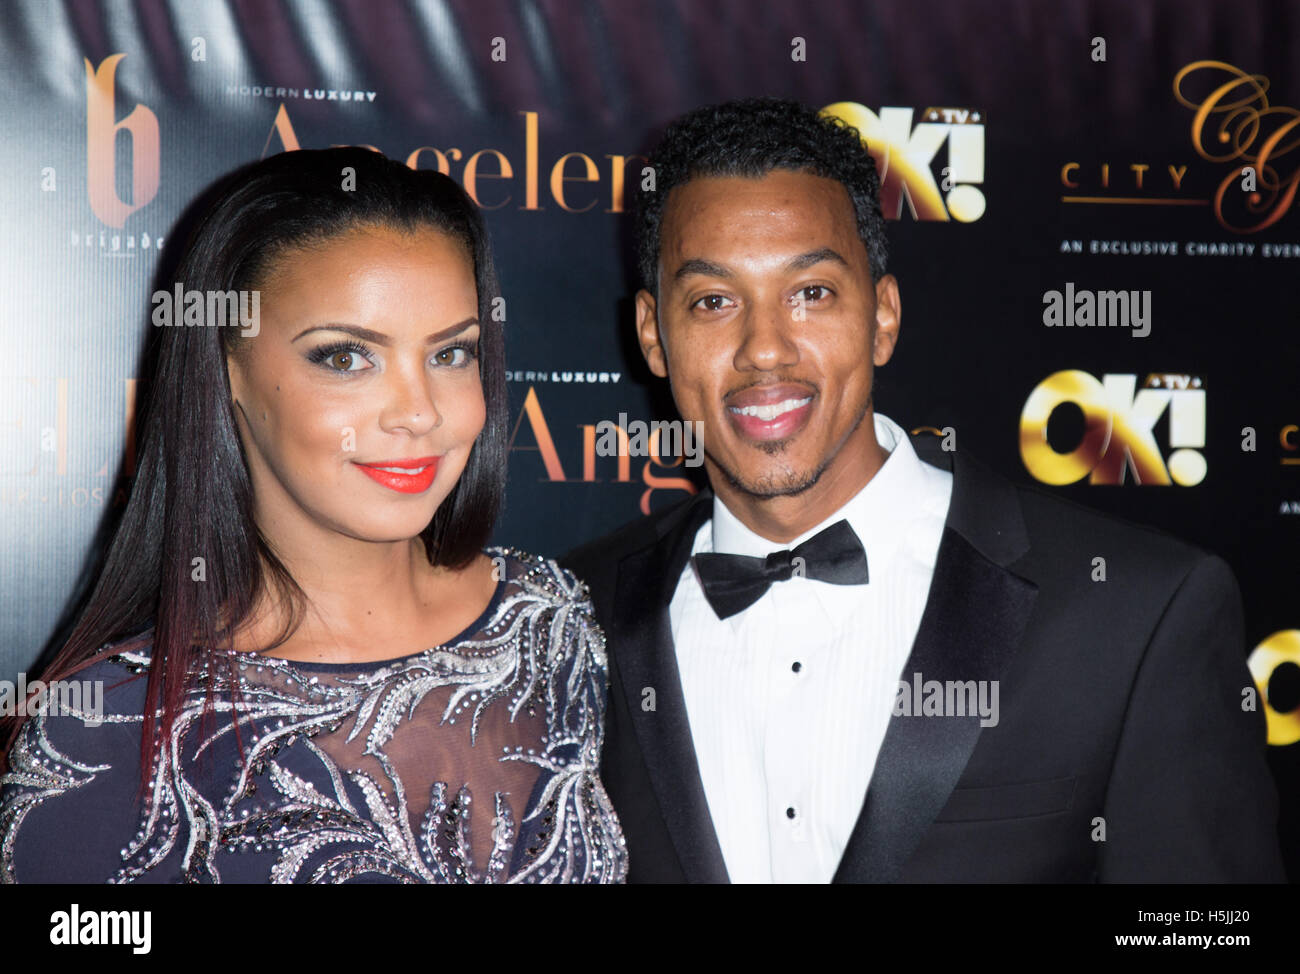 Wesley jonathan dating 2014